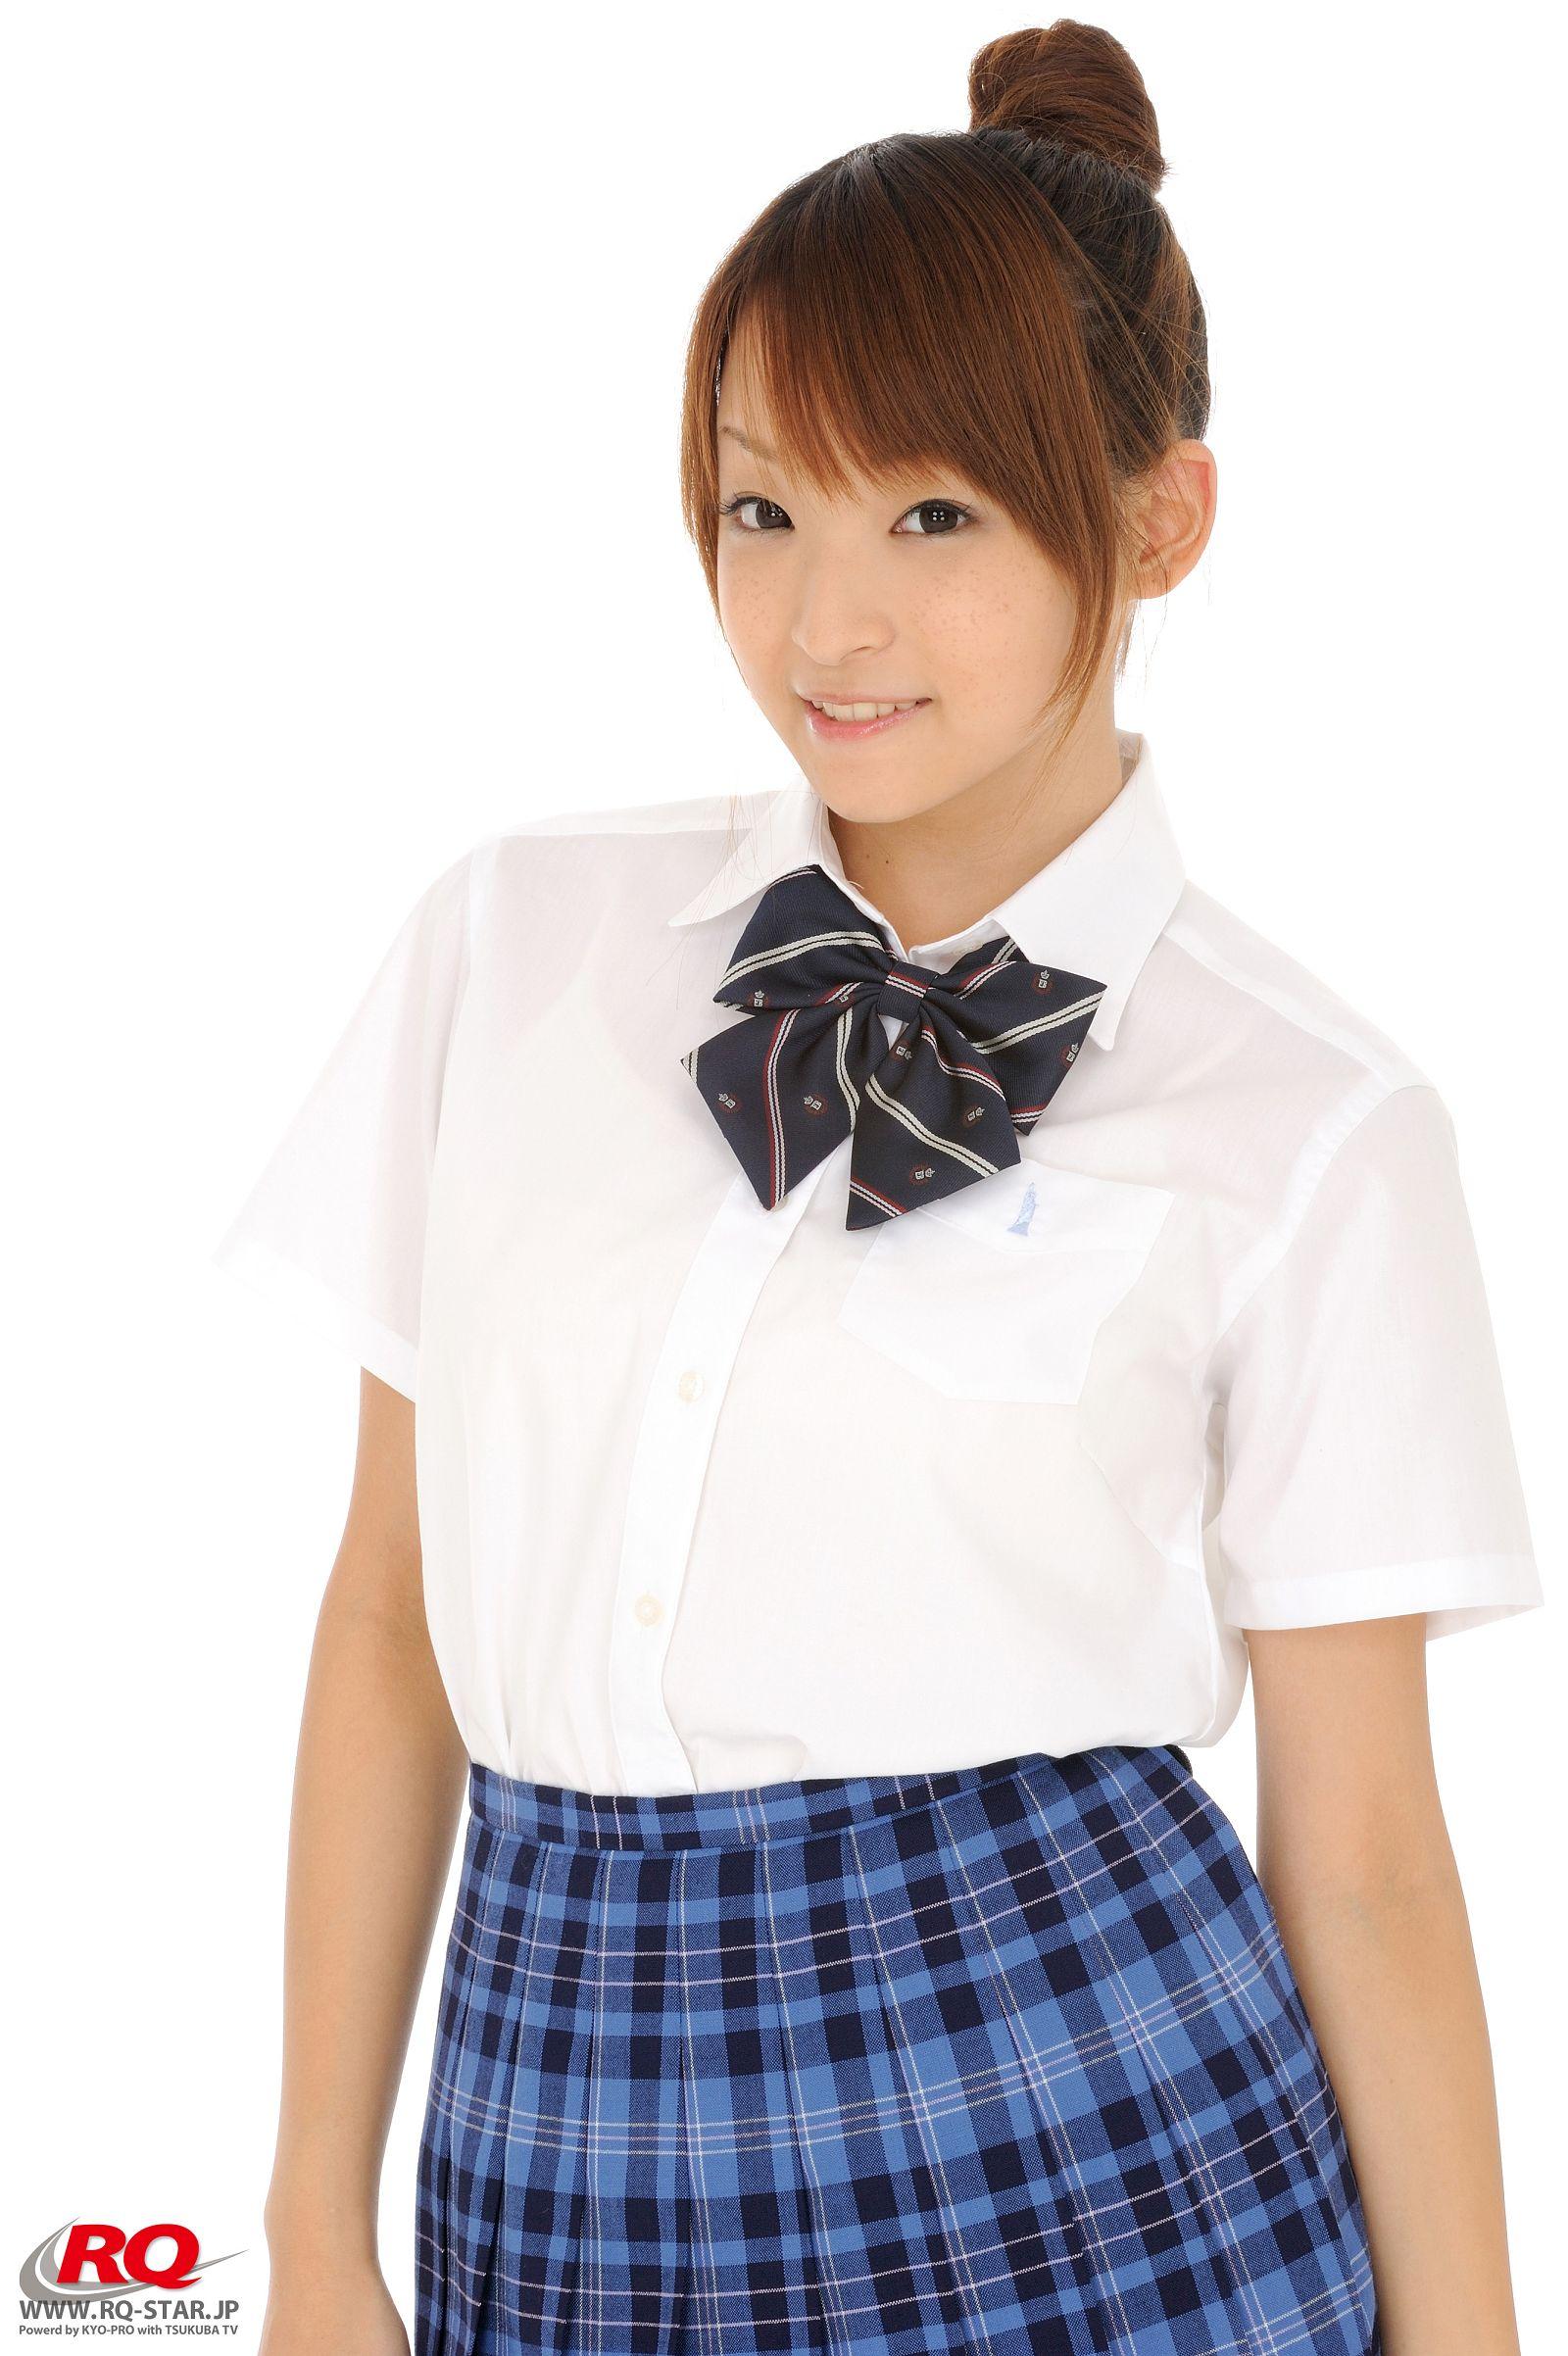 [RQ STAR美女] NO.01152 Mio Aoki 青木未央 Student Style[50P] RQ STAR 第1张